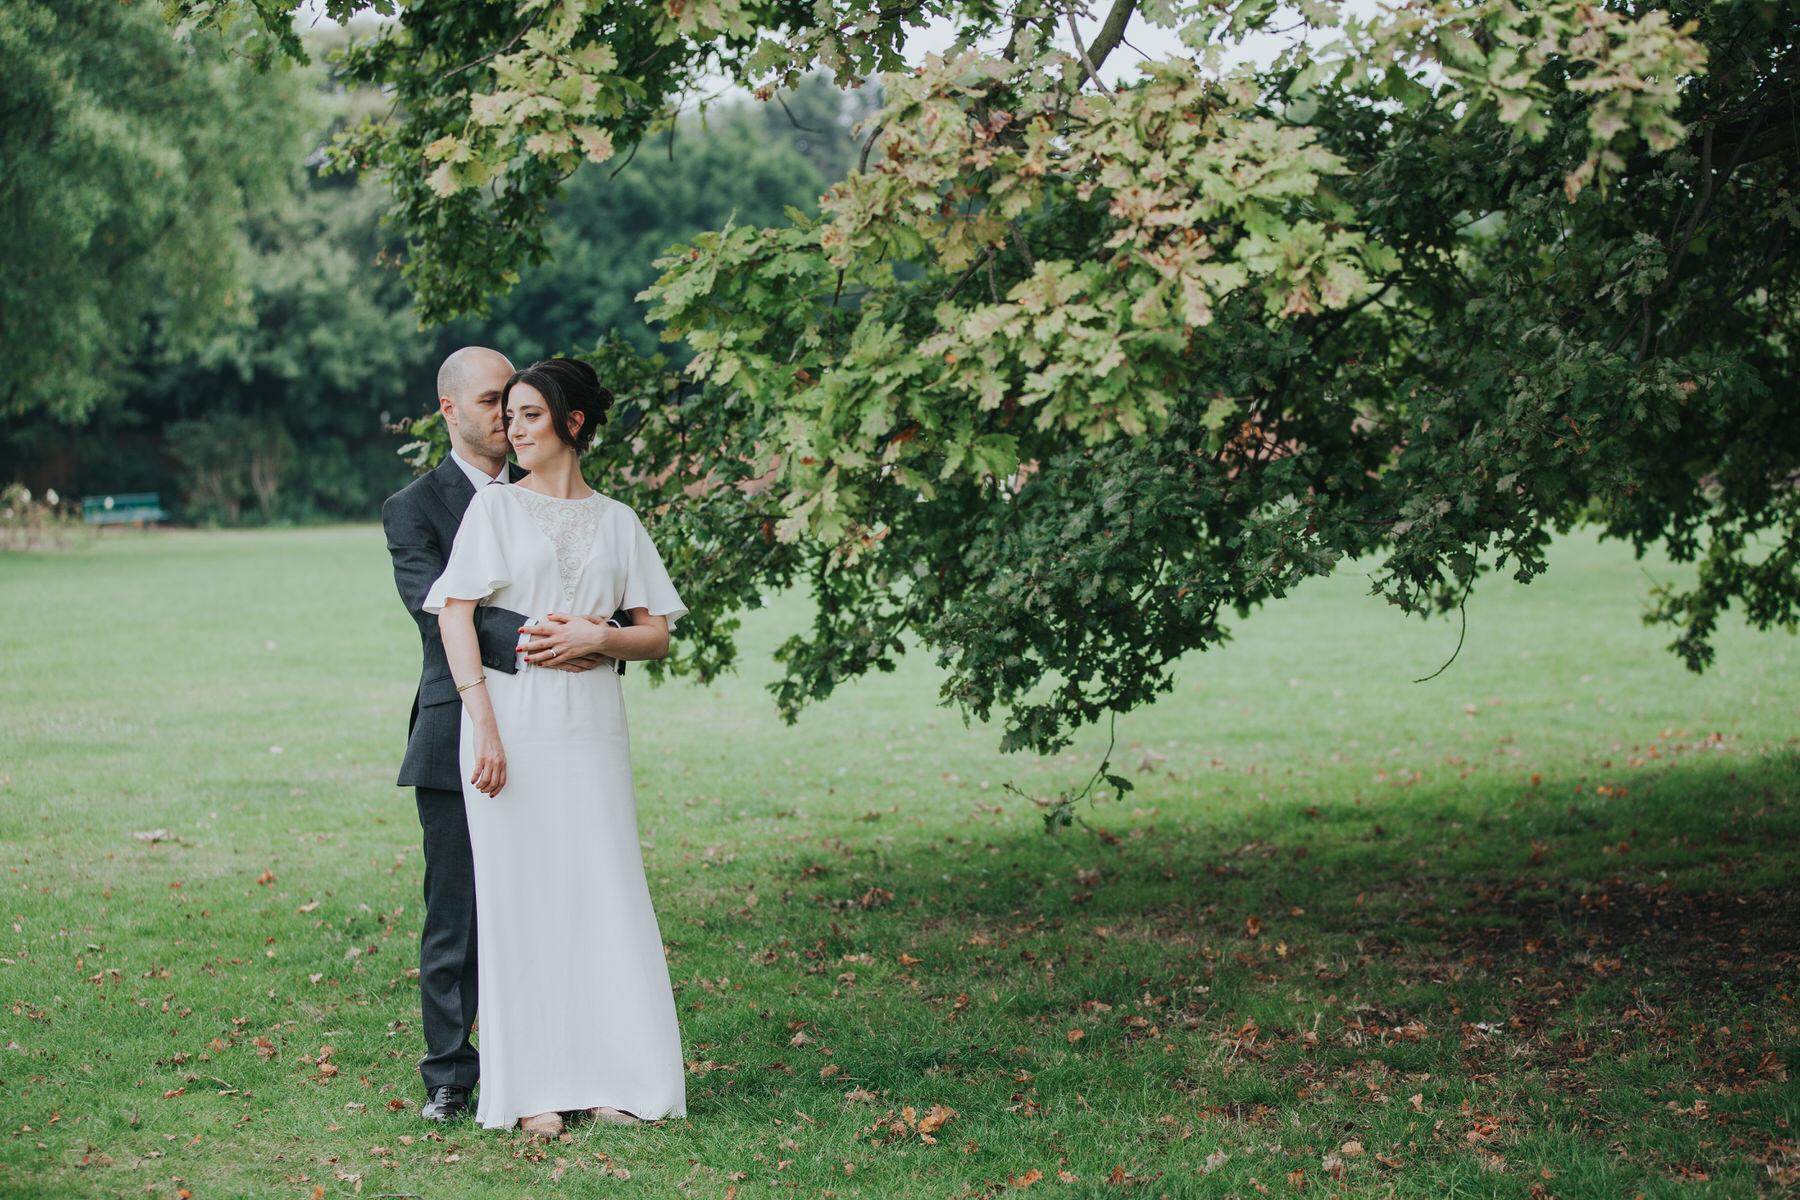 188 Belair Park natural wedding photos unobtrusive.jpg